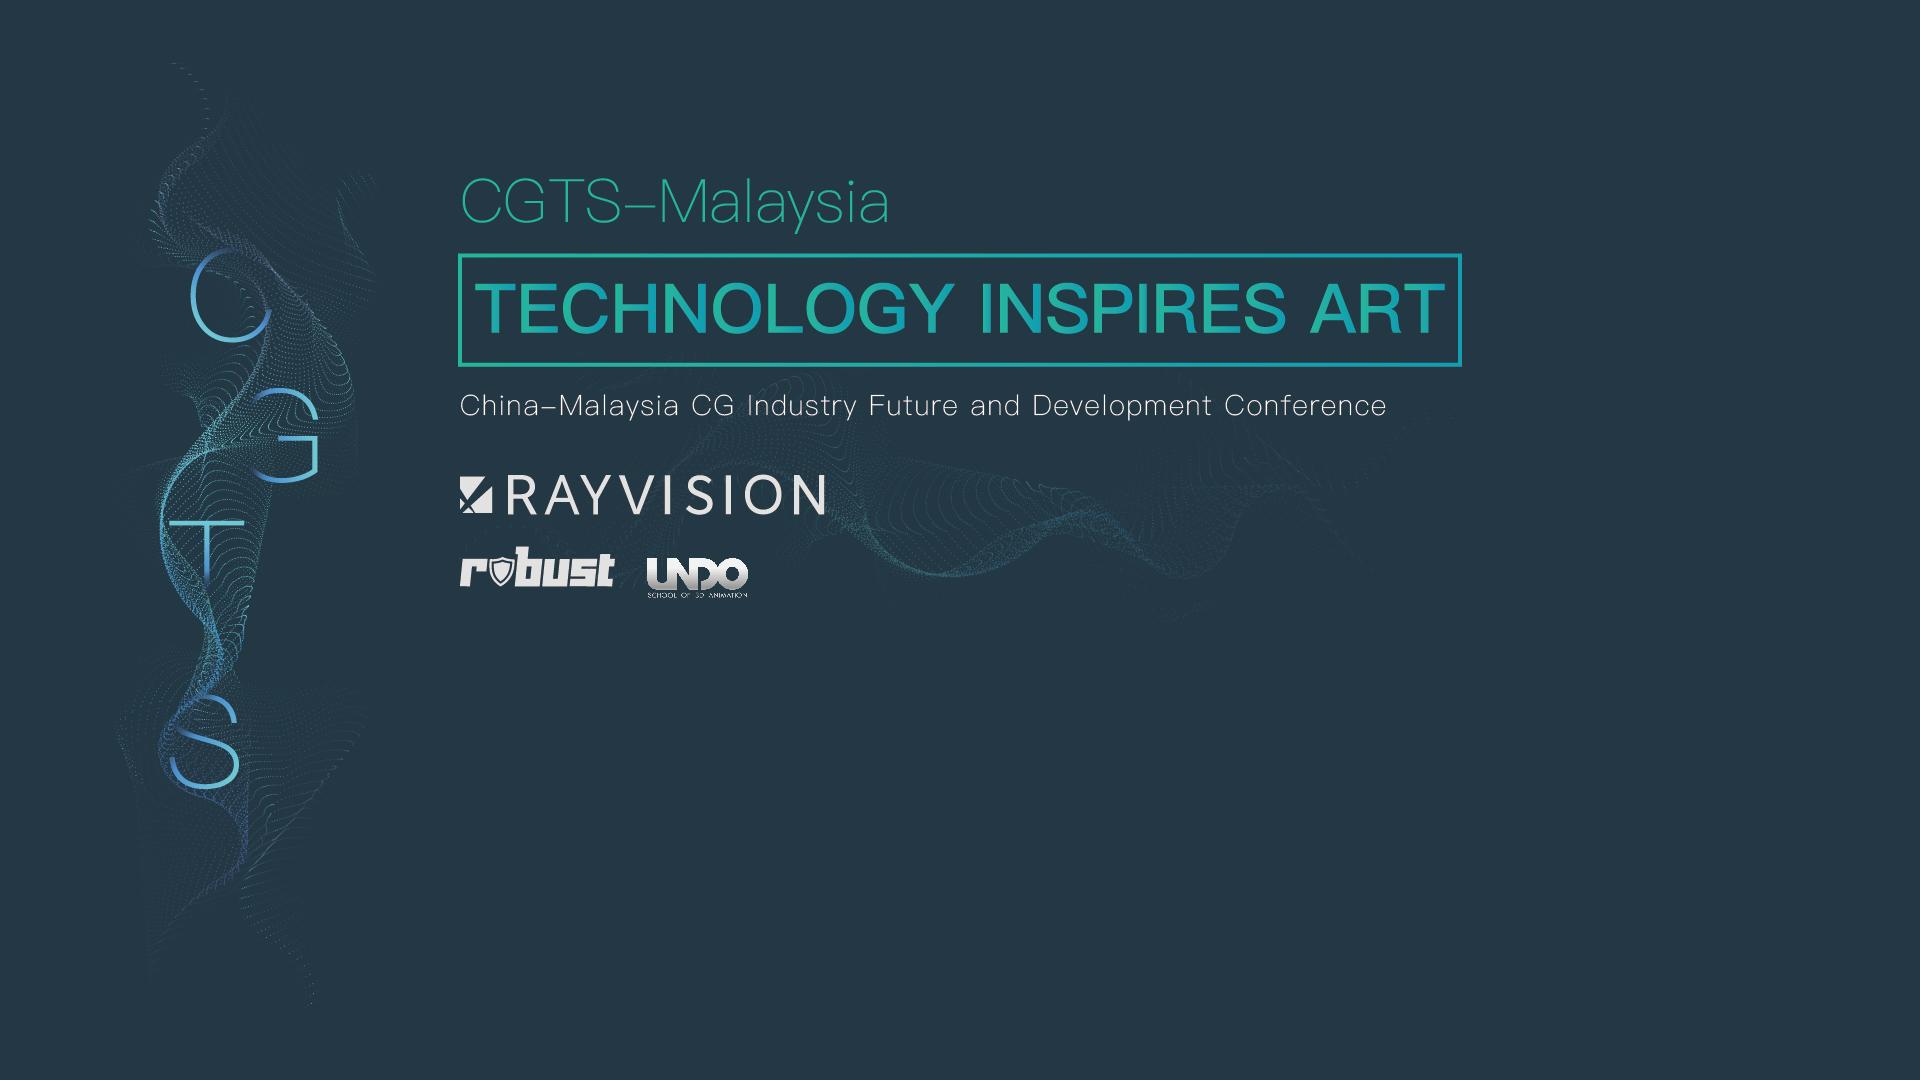 CGTS-Malaysia Sparks Your Creativity